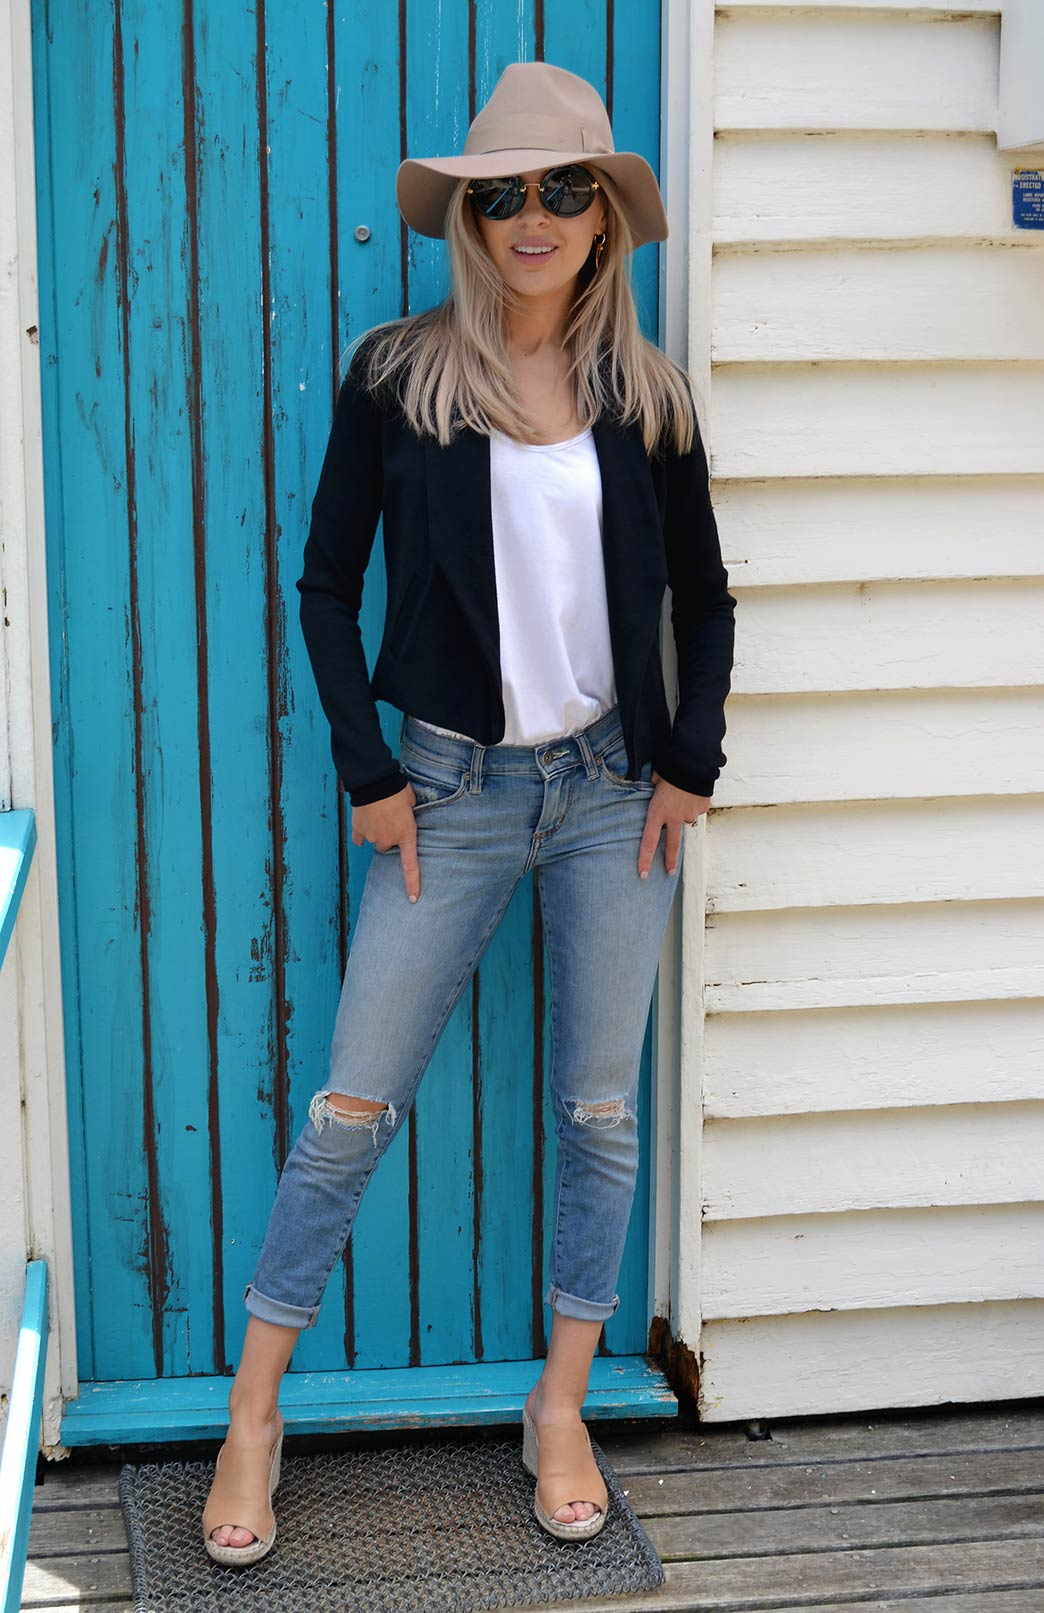 Lapel Jacket - Heavyweight - Women's Black Wool Lapel Jacket with side pockets and long sleeves - Smitten Merino Tasmania Australia